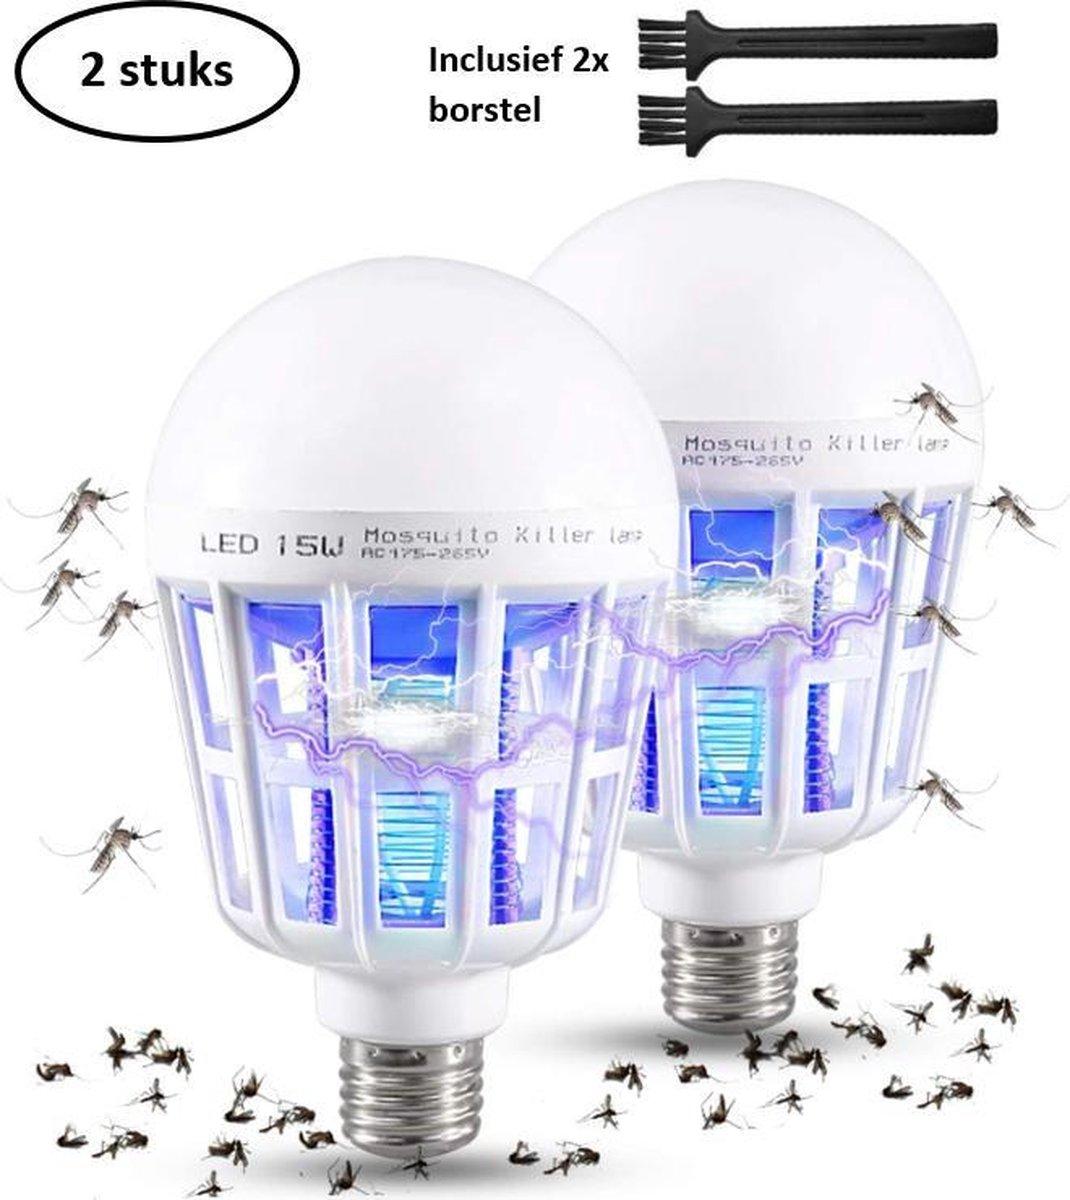 Luxergoods 3 in 1 Muggenvanger - Insectenlamp - mosquito killer - stil - Fitting - geen last van vli